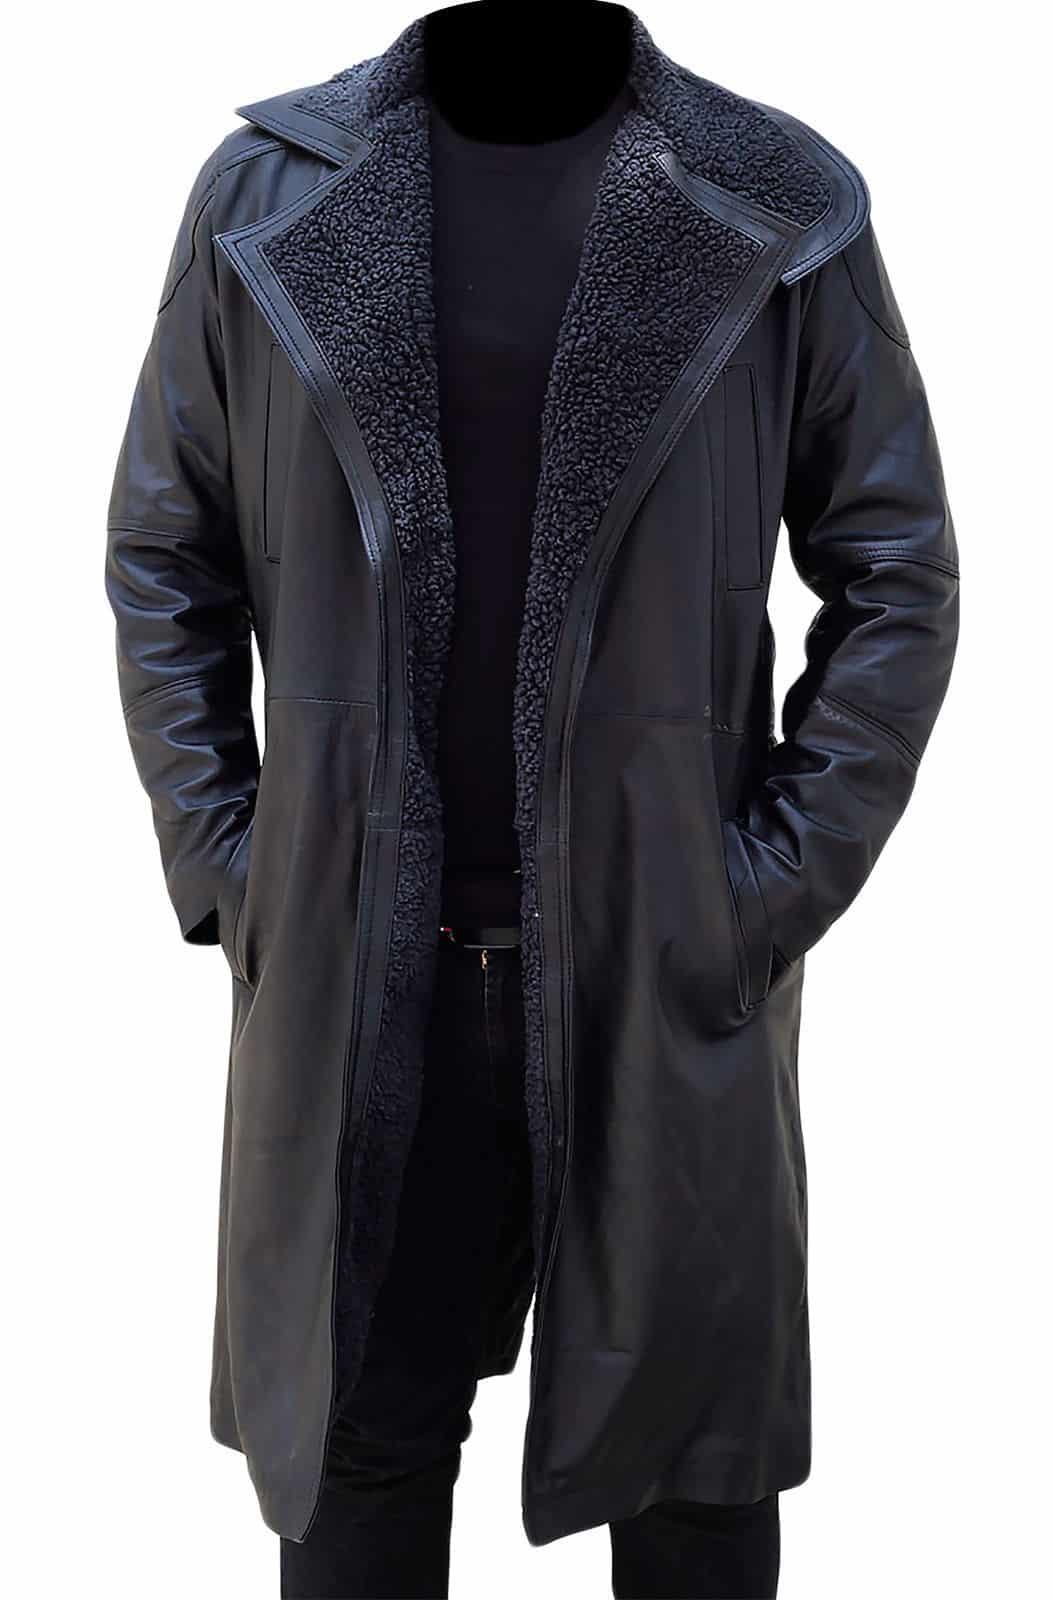 aa0260f06 Blade Runner 2049 Ryan Gosling Real Leather Shearling Coat